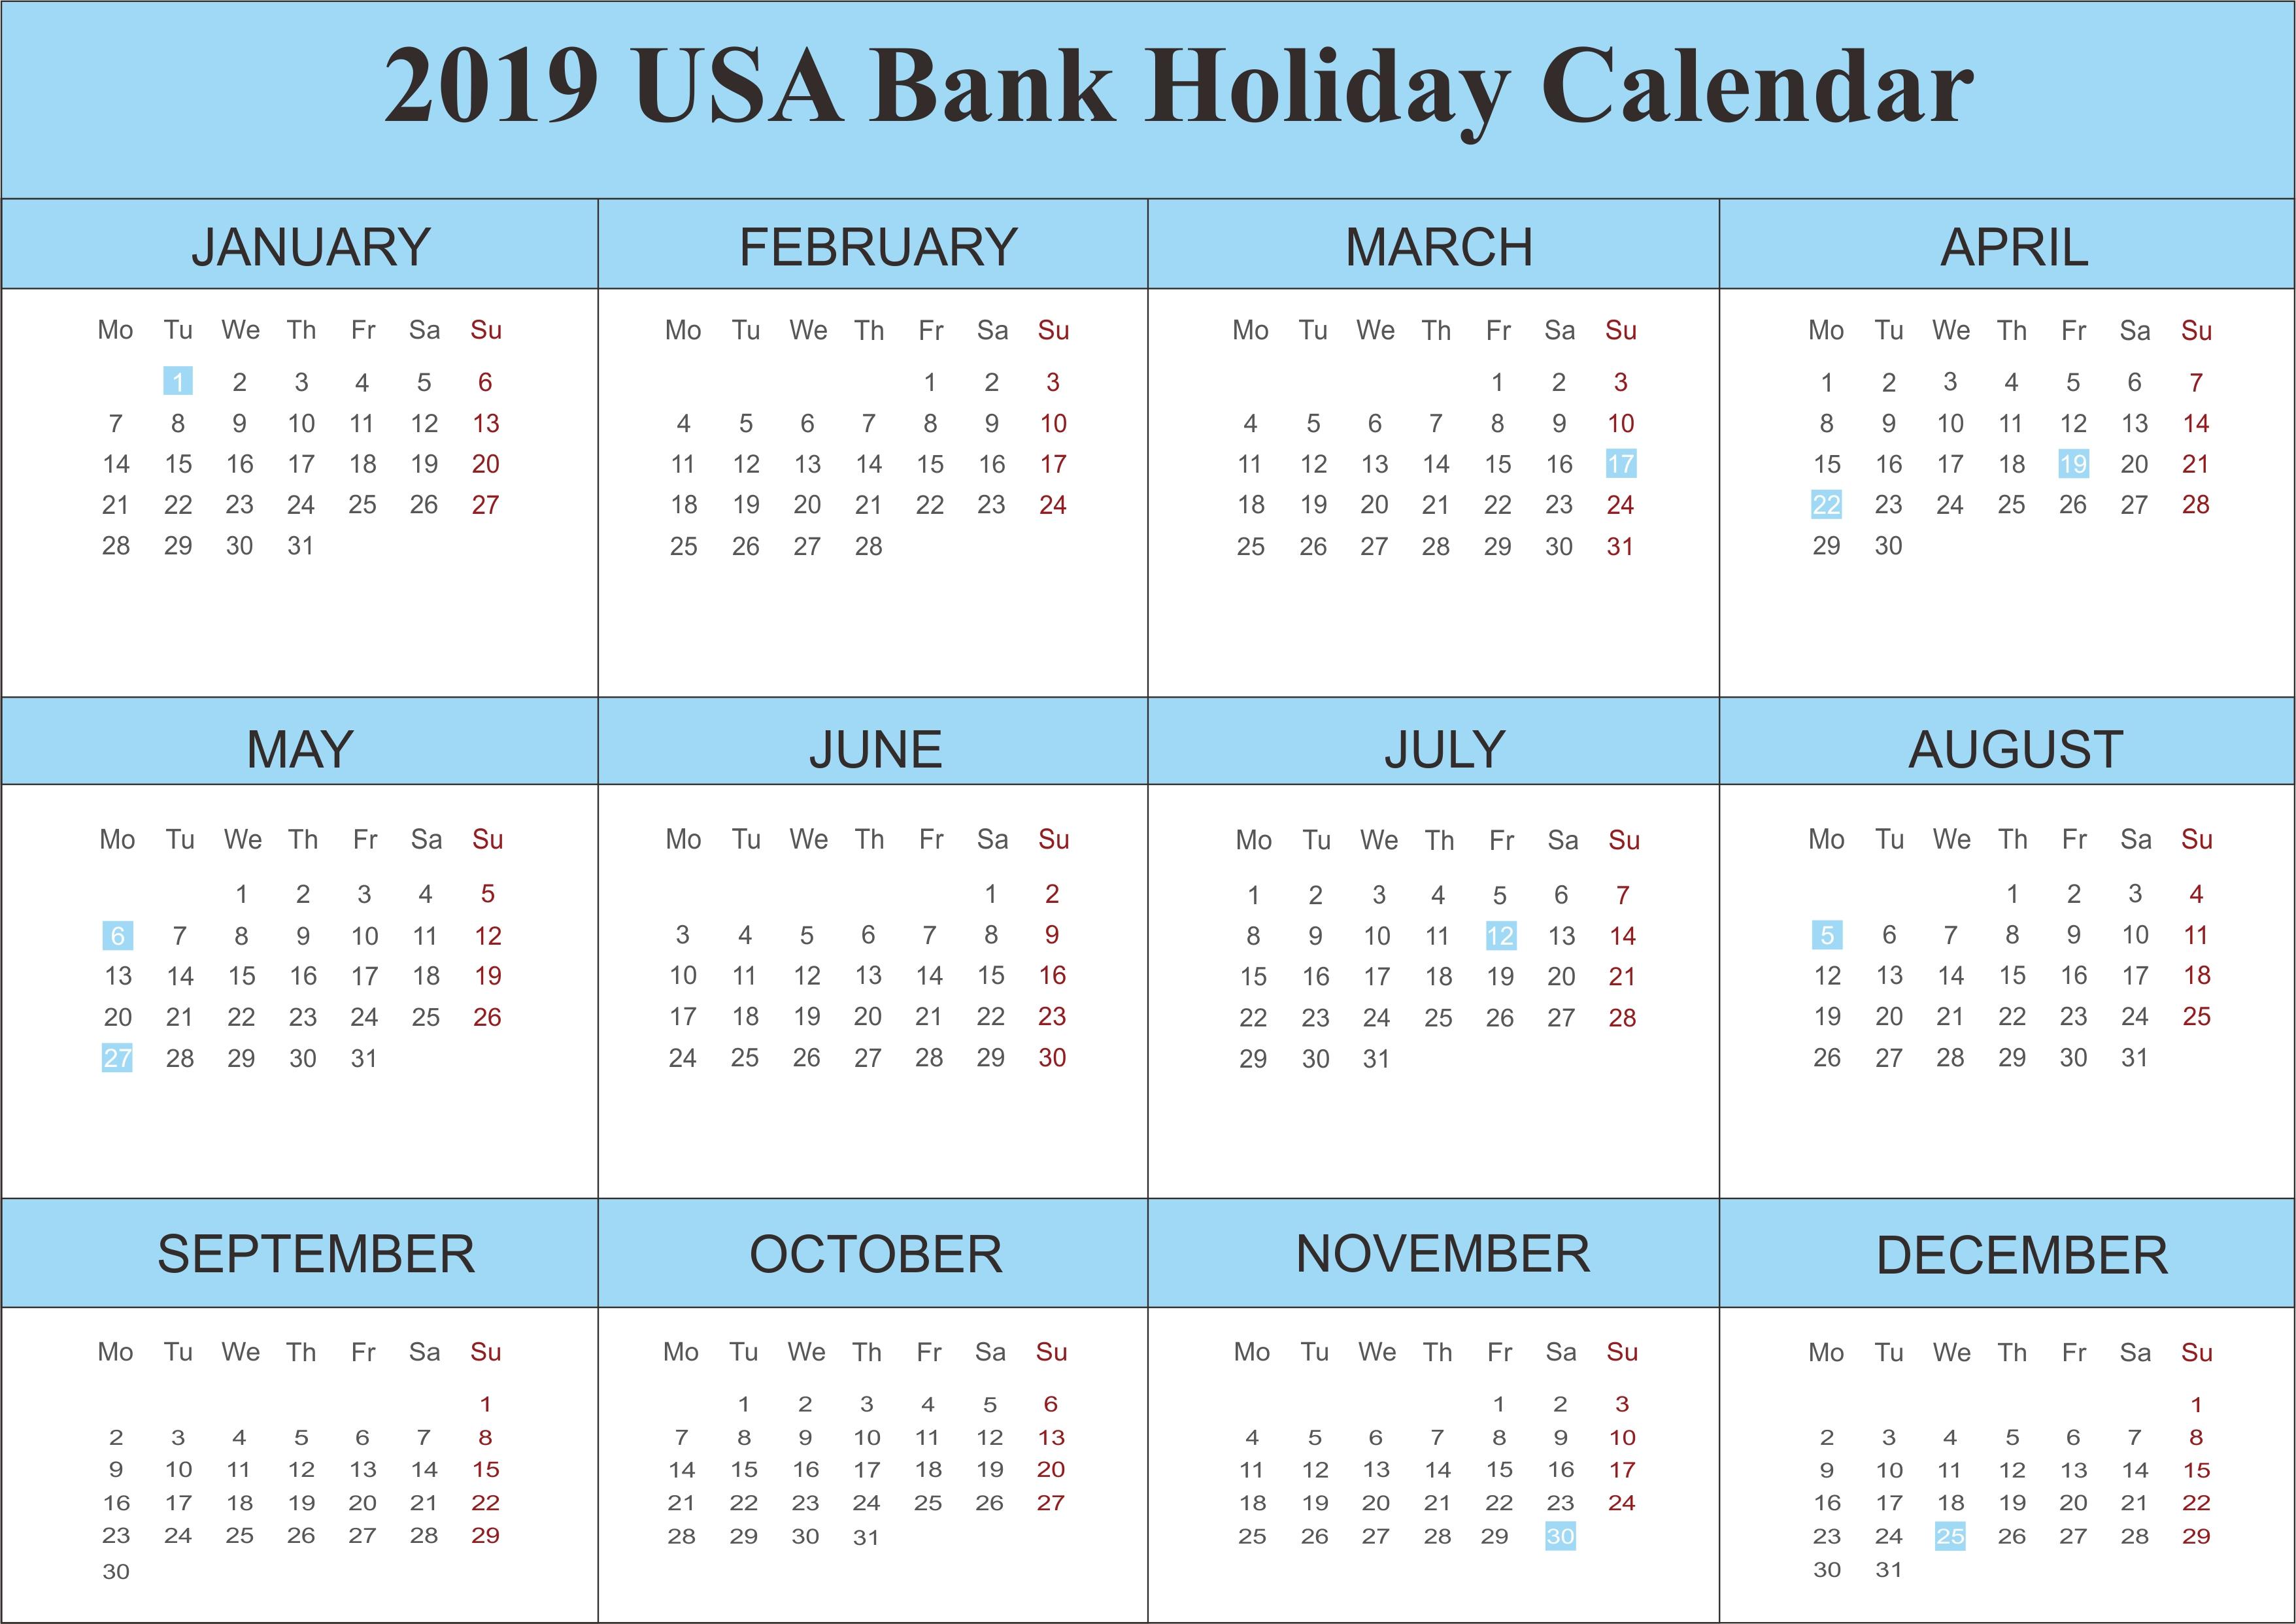 2019 Usa Bank Holidays Calendar | 250+ Free Monthly Calendar-Six Monthly New Zealand Calendars